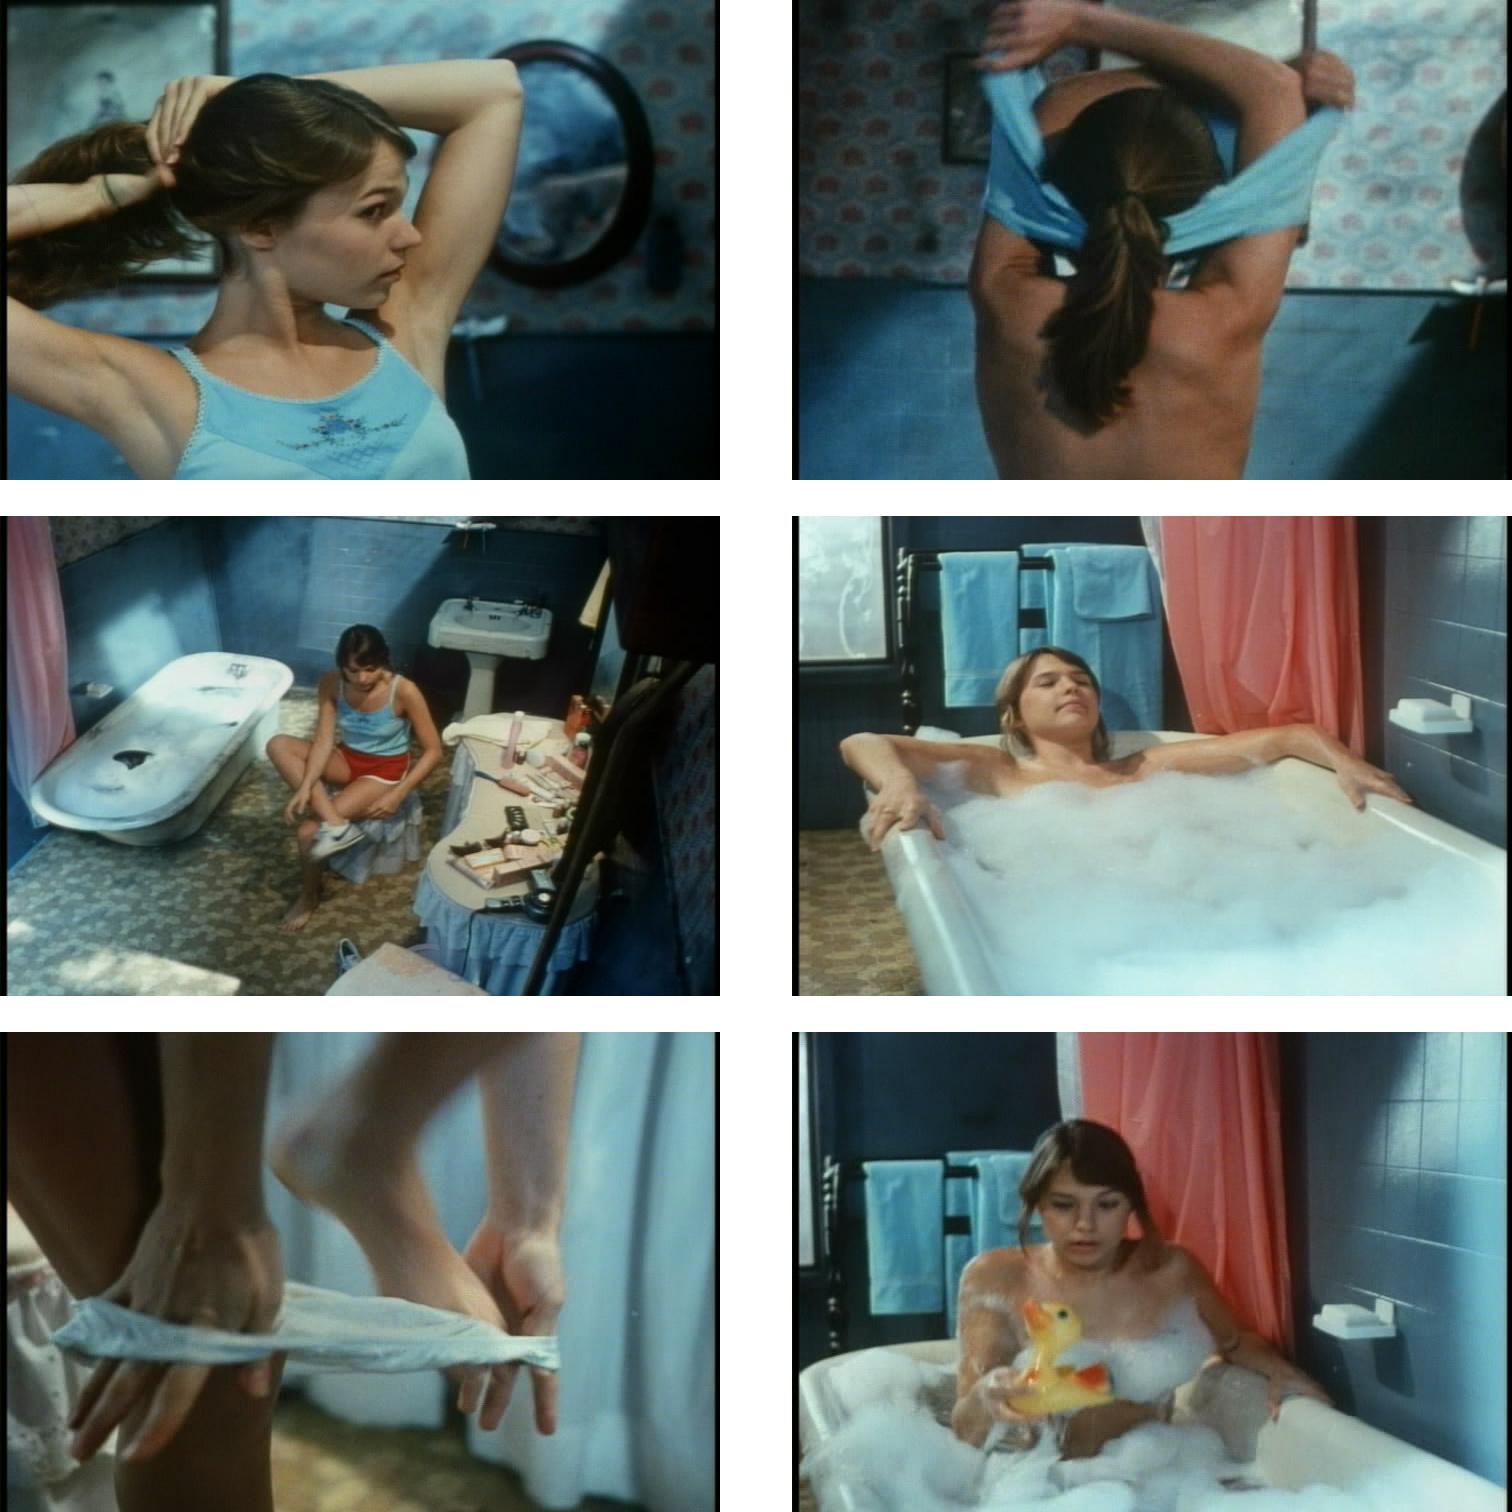 21 excellent mirrors bathroom scene for Bathroom scenes photos